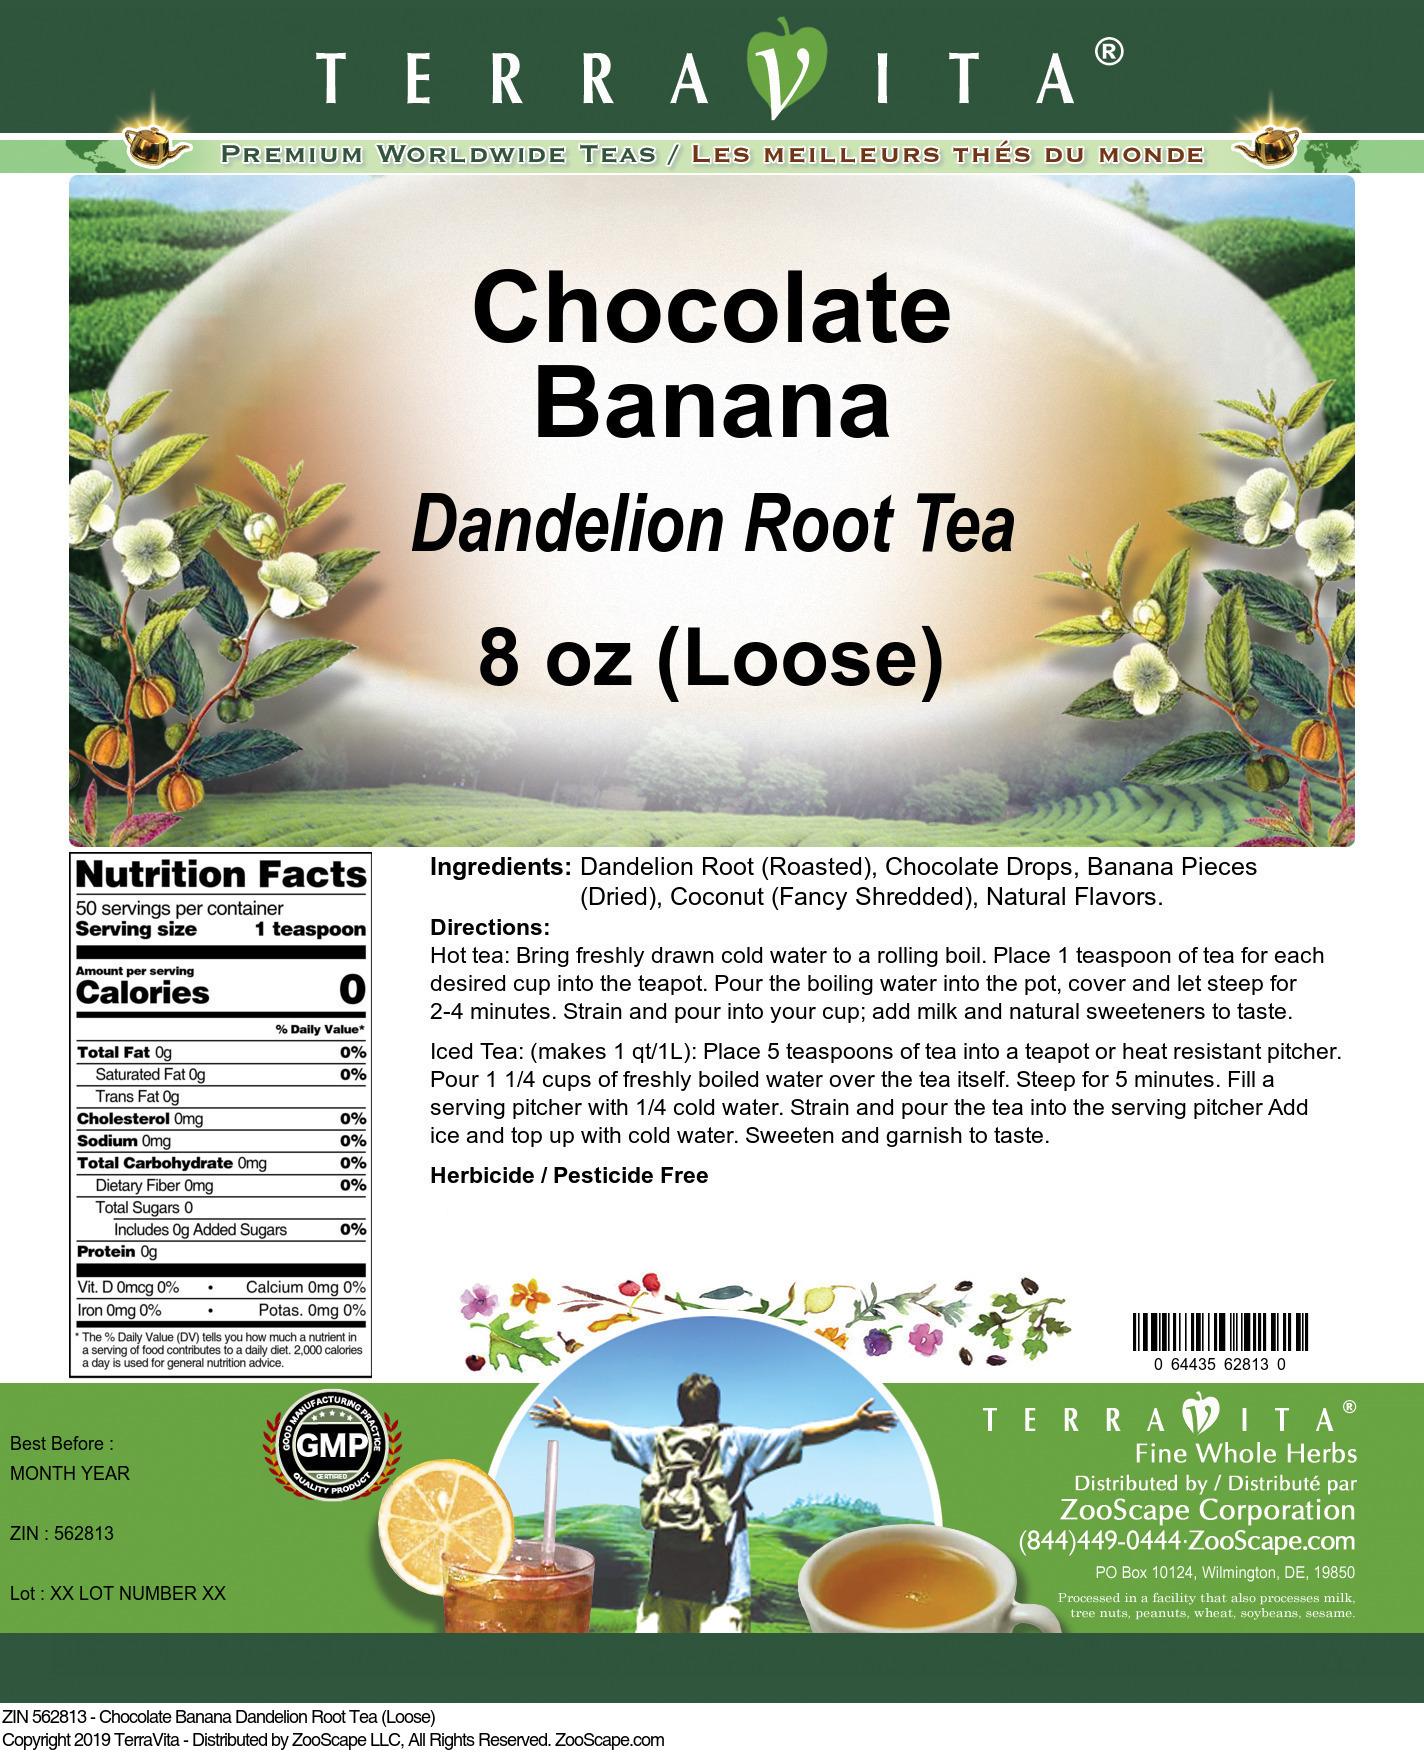 Chocolate Banana Dandelion Root